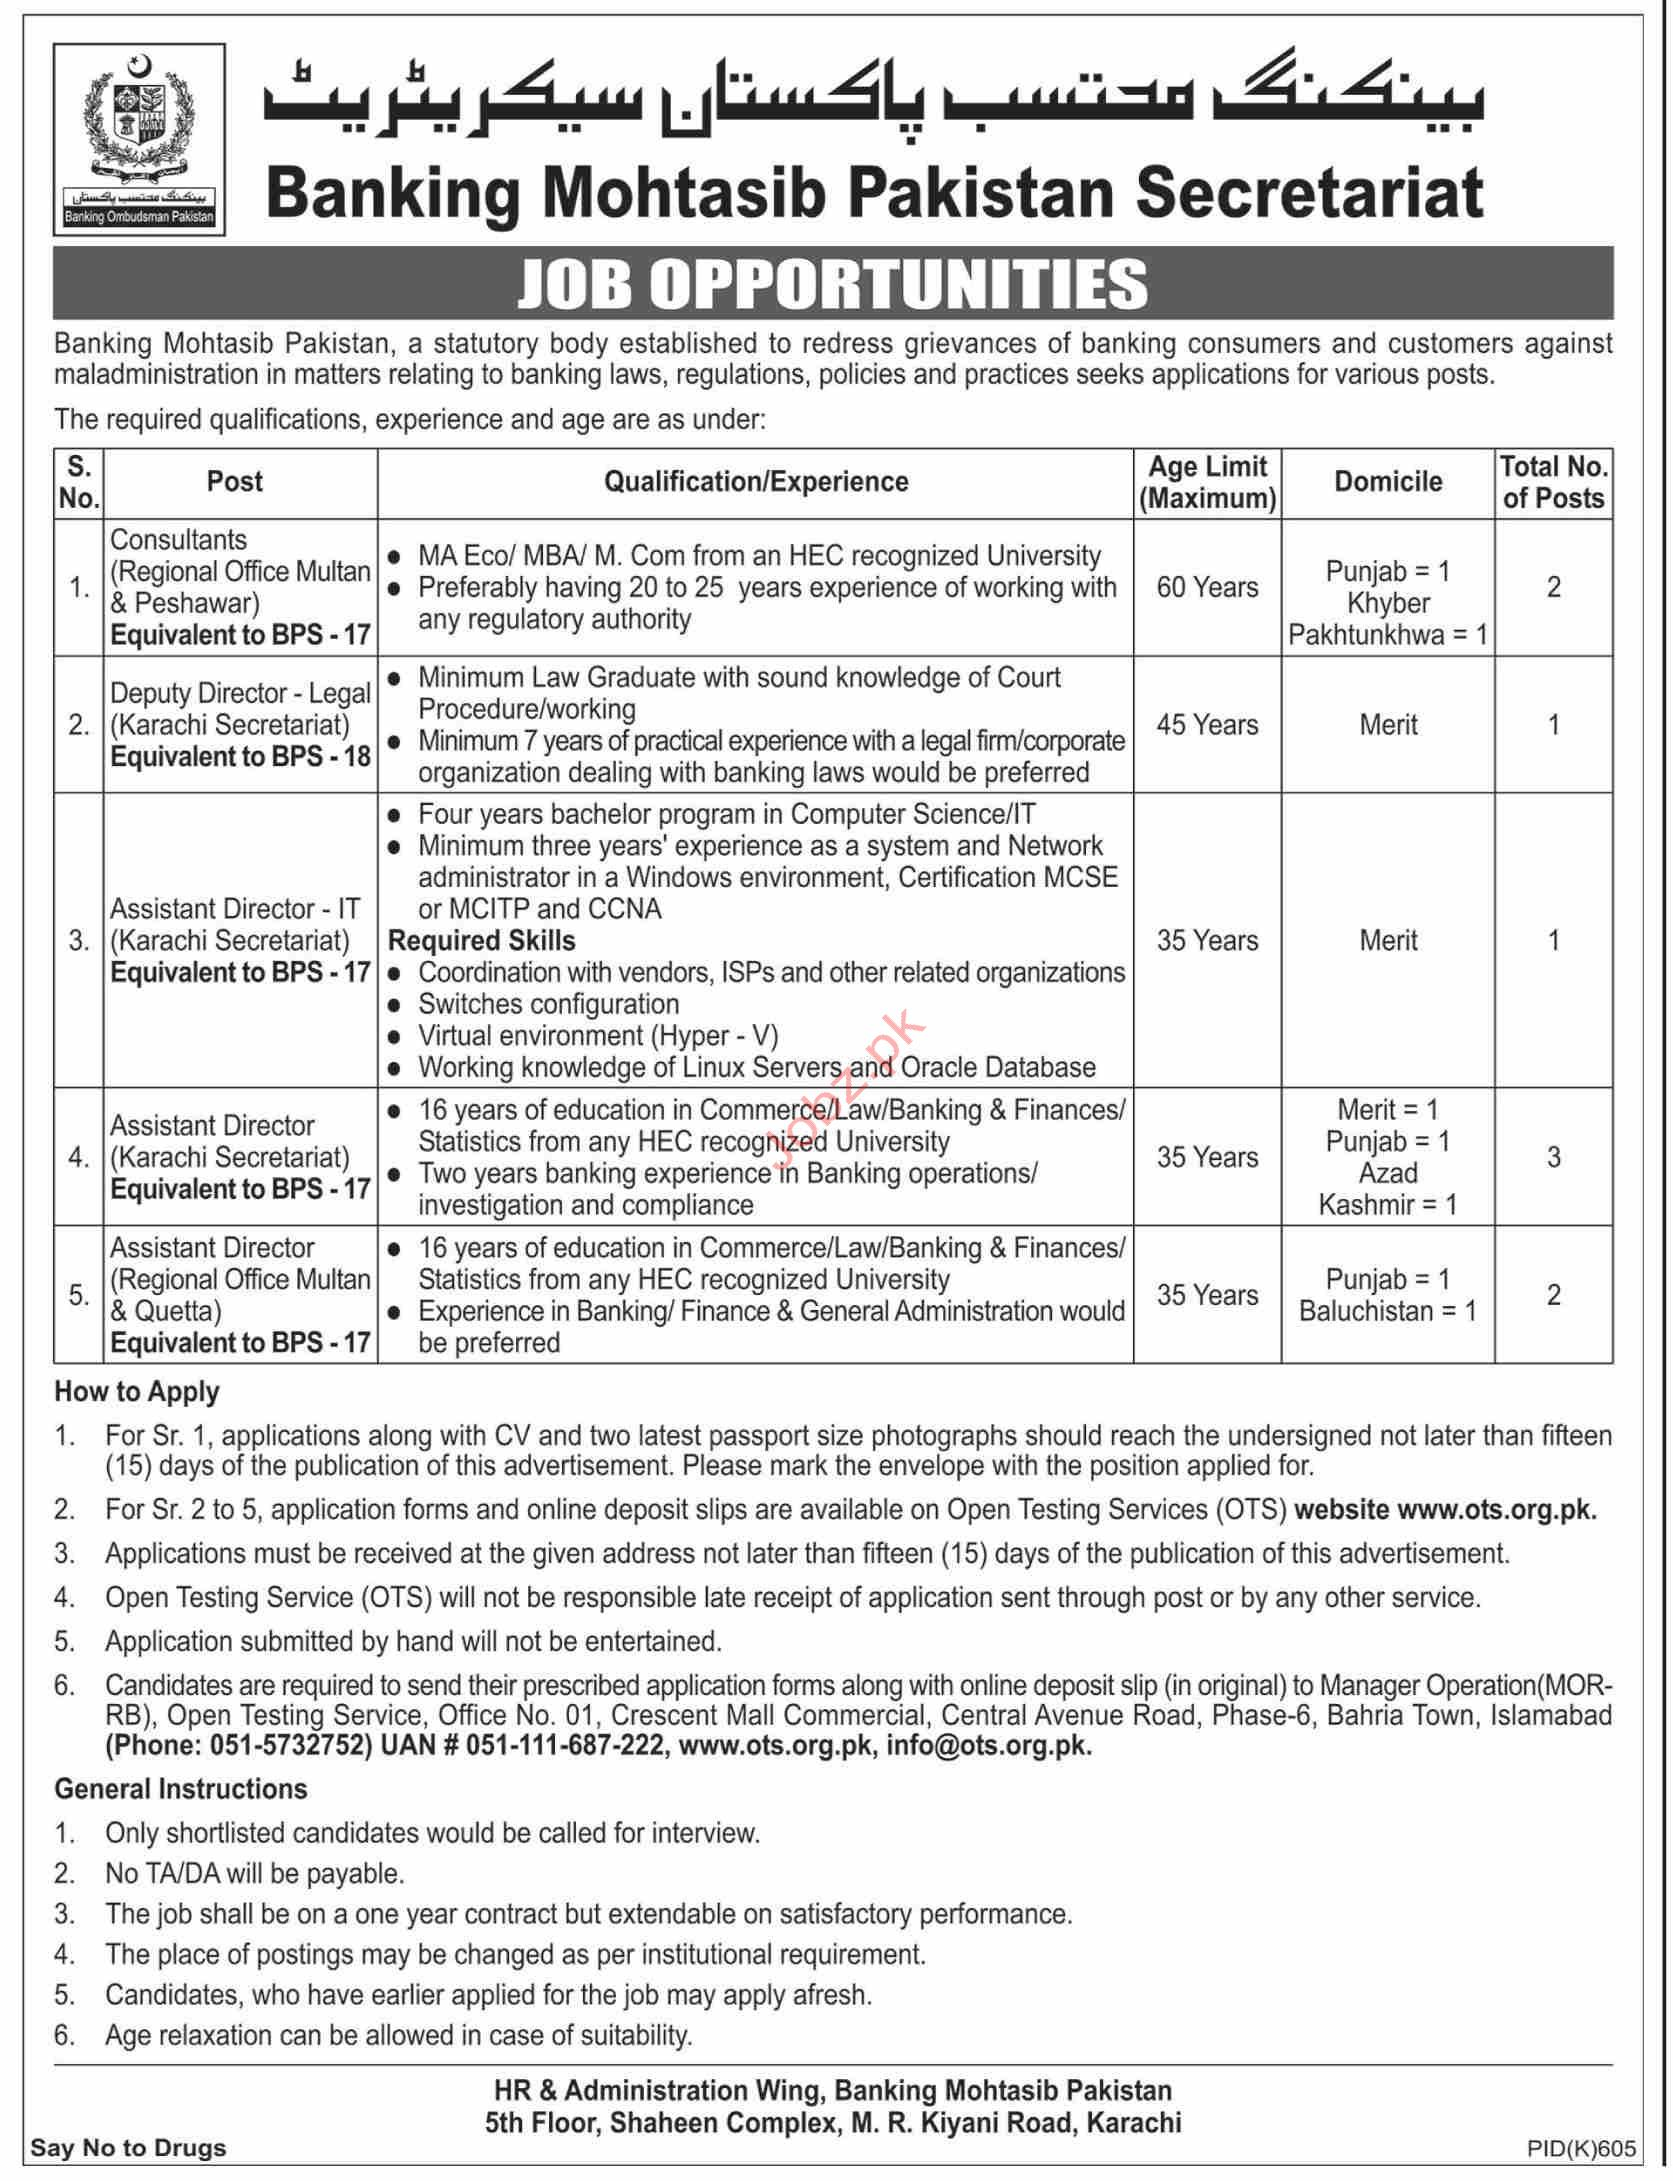 Banking Mohtasib Pakistan Secretariat Jobs